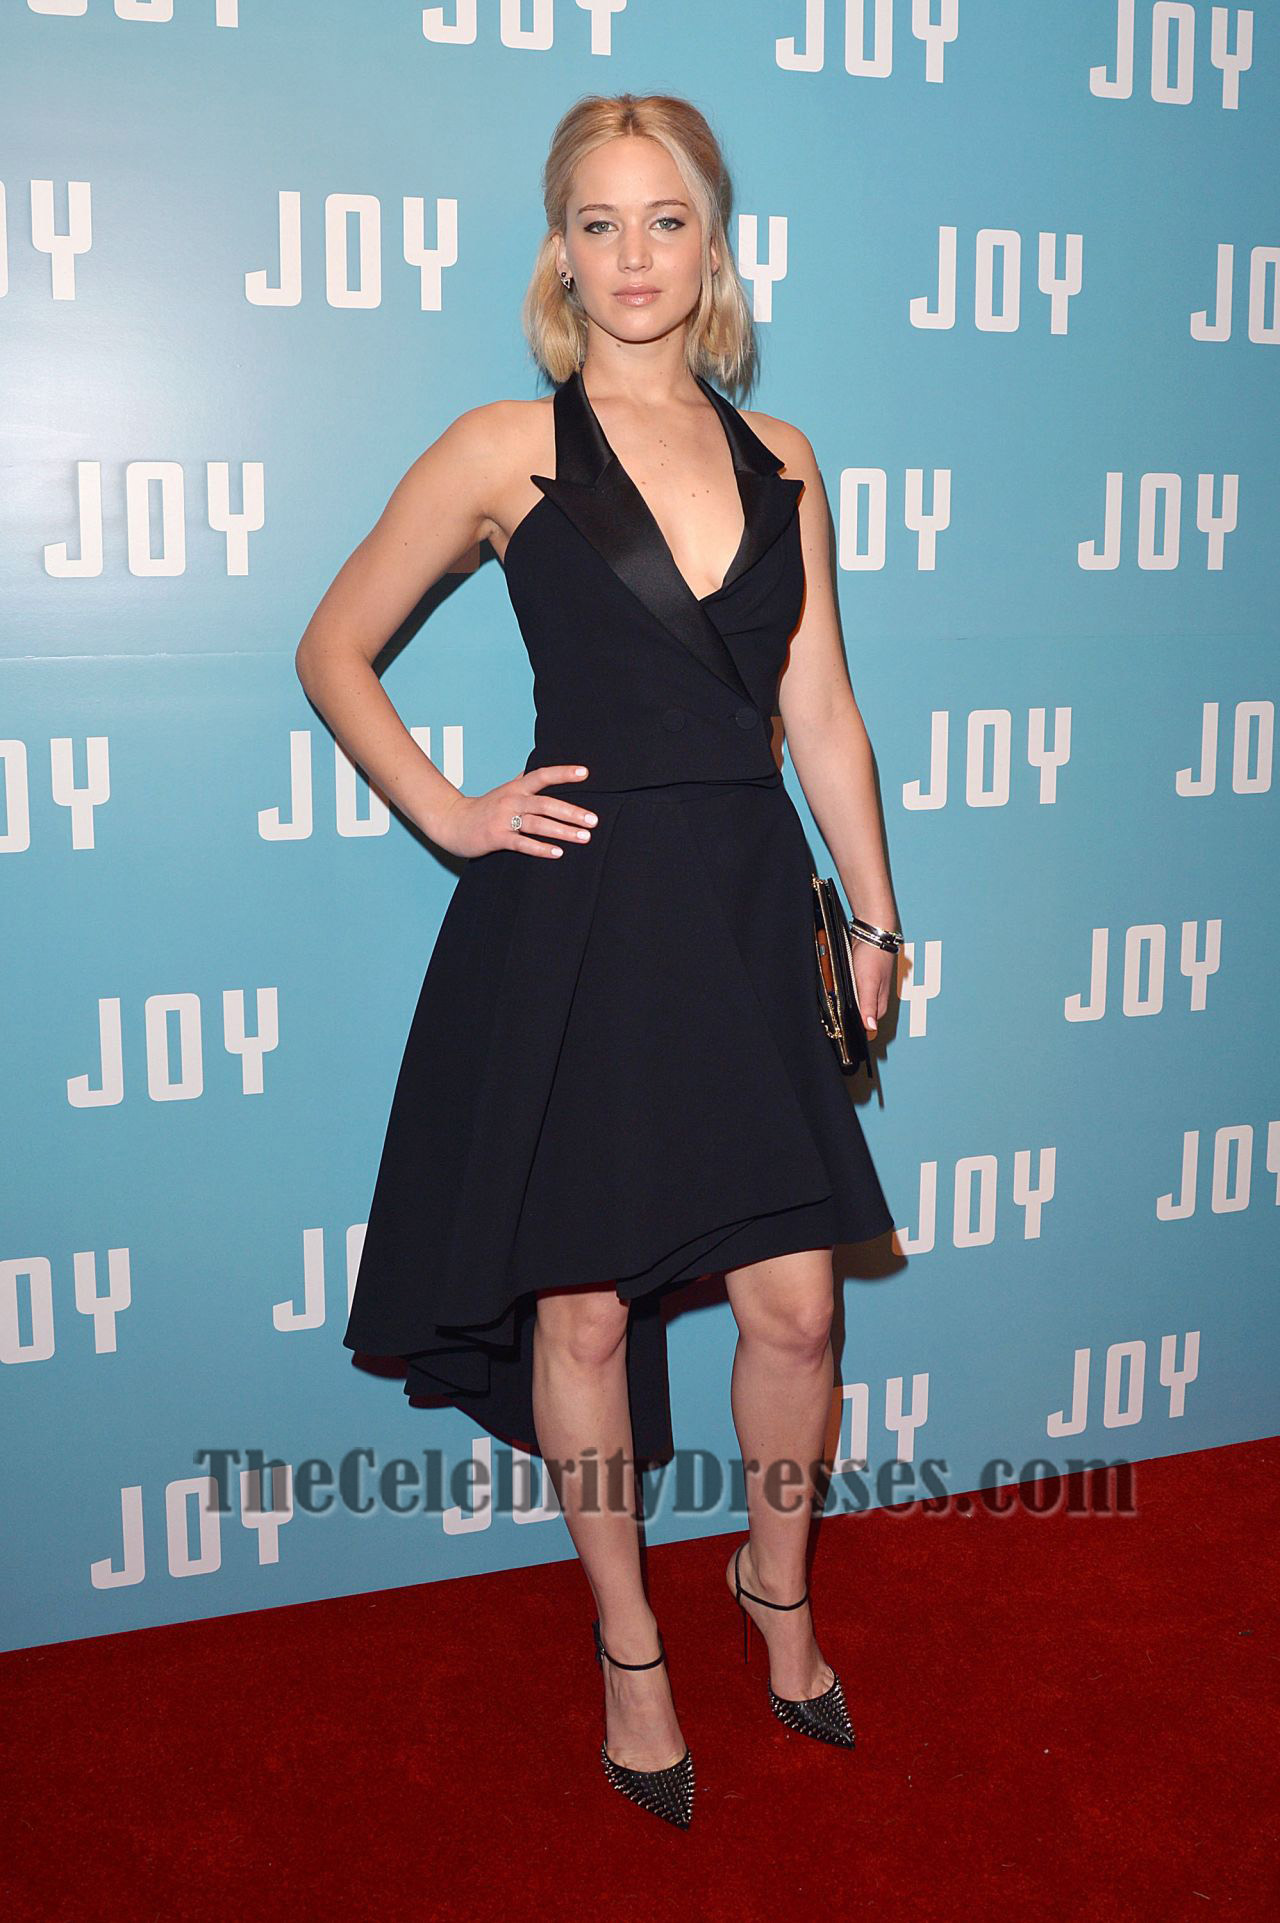 Jennifer Lawrence Short Black Party Dress \'Joy\' London Screening ...